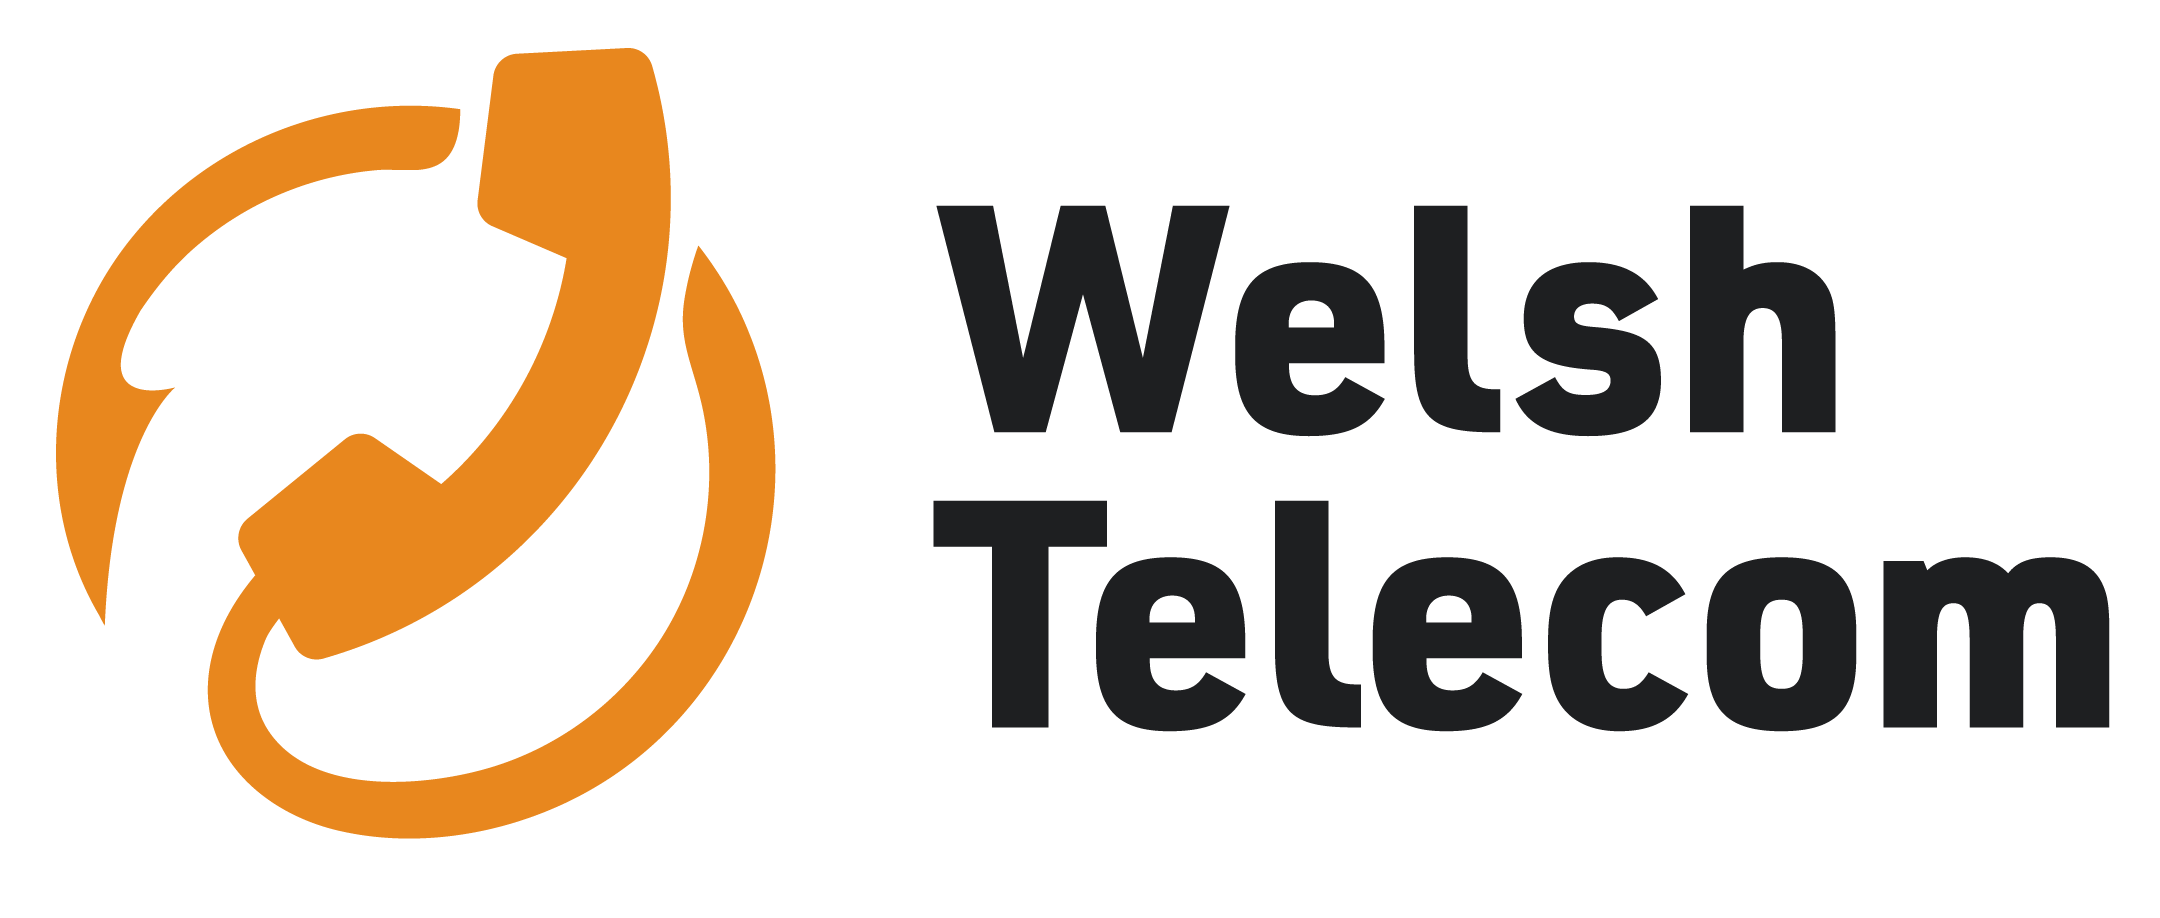 Welsh Telecom